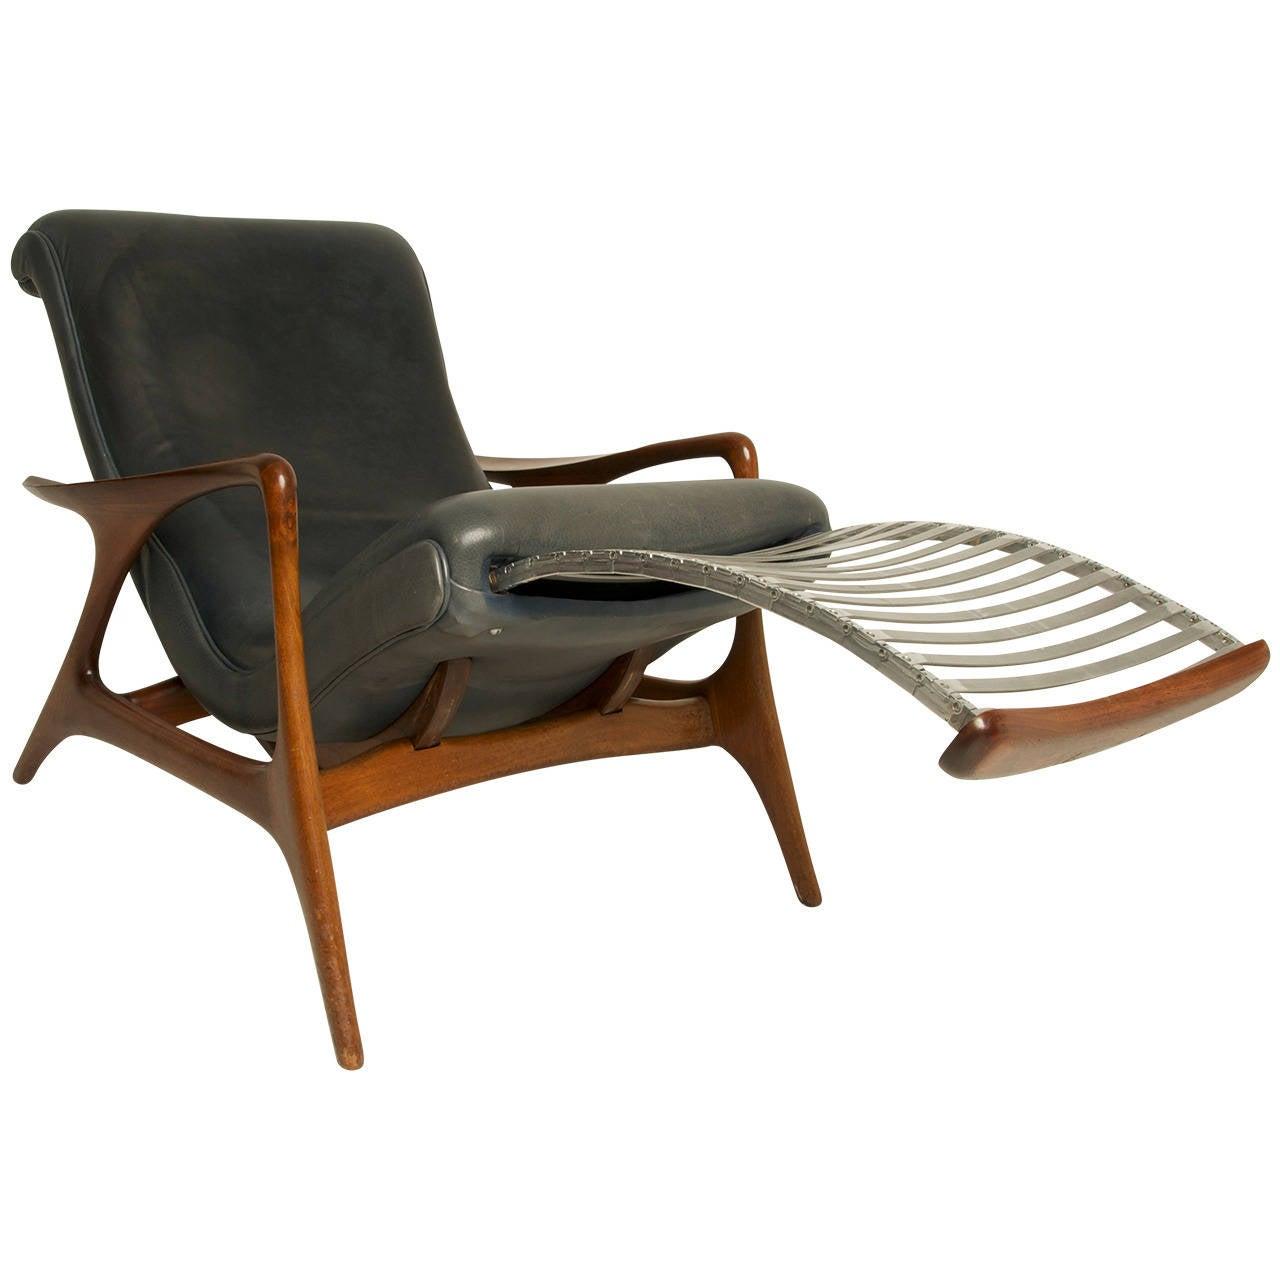 Very rare vladimir kagan multi position reclining chair vk100x at